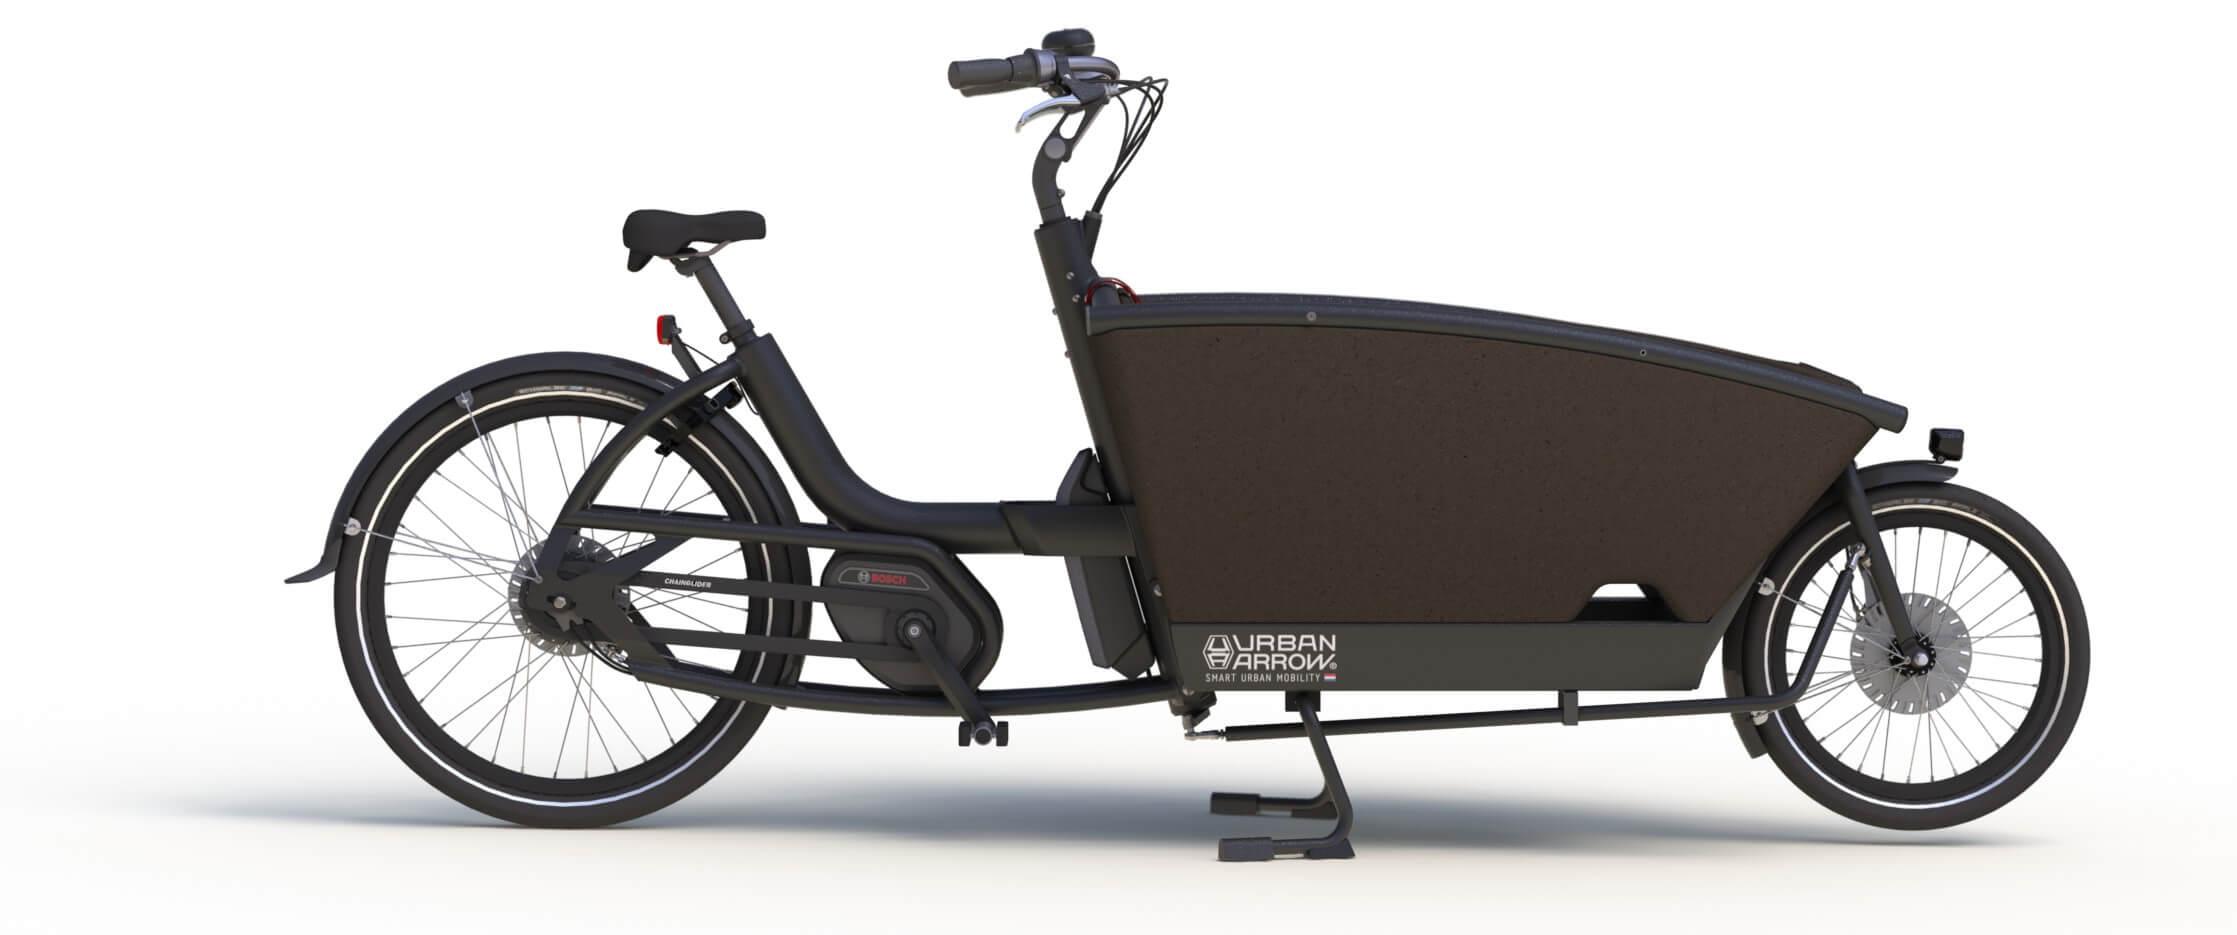 Urban Arrow Family e-bike 2017 - zwart